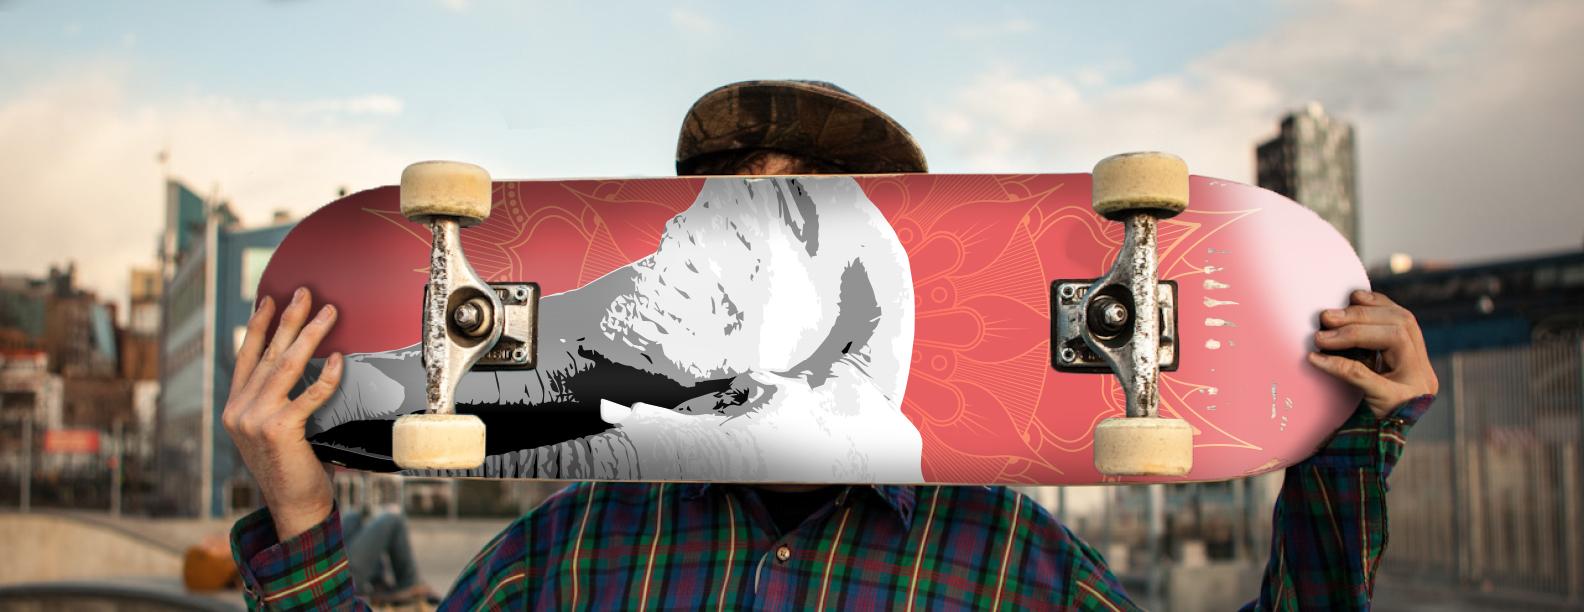 skateboard_image_replace.jpg